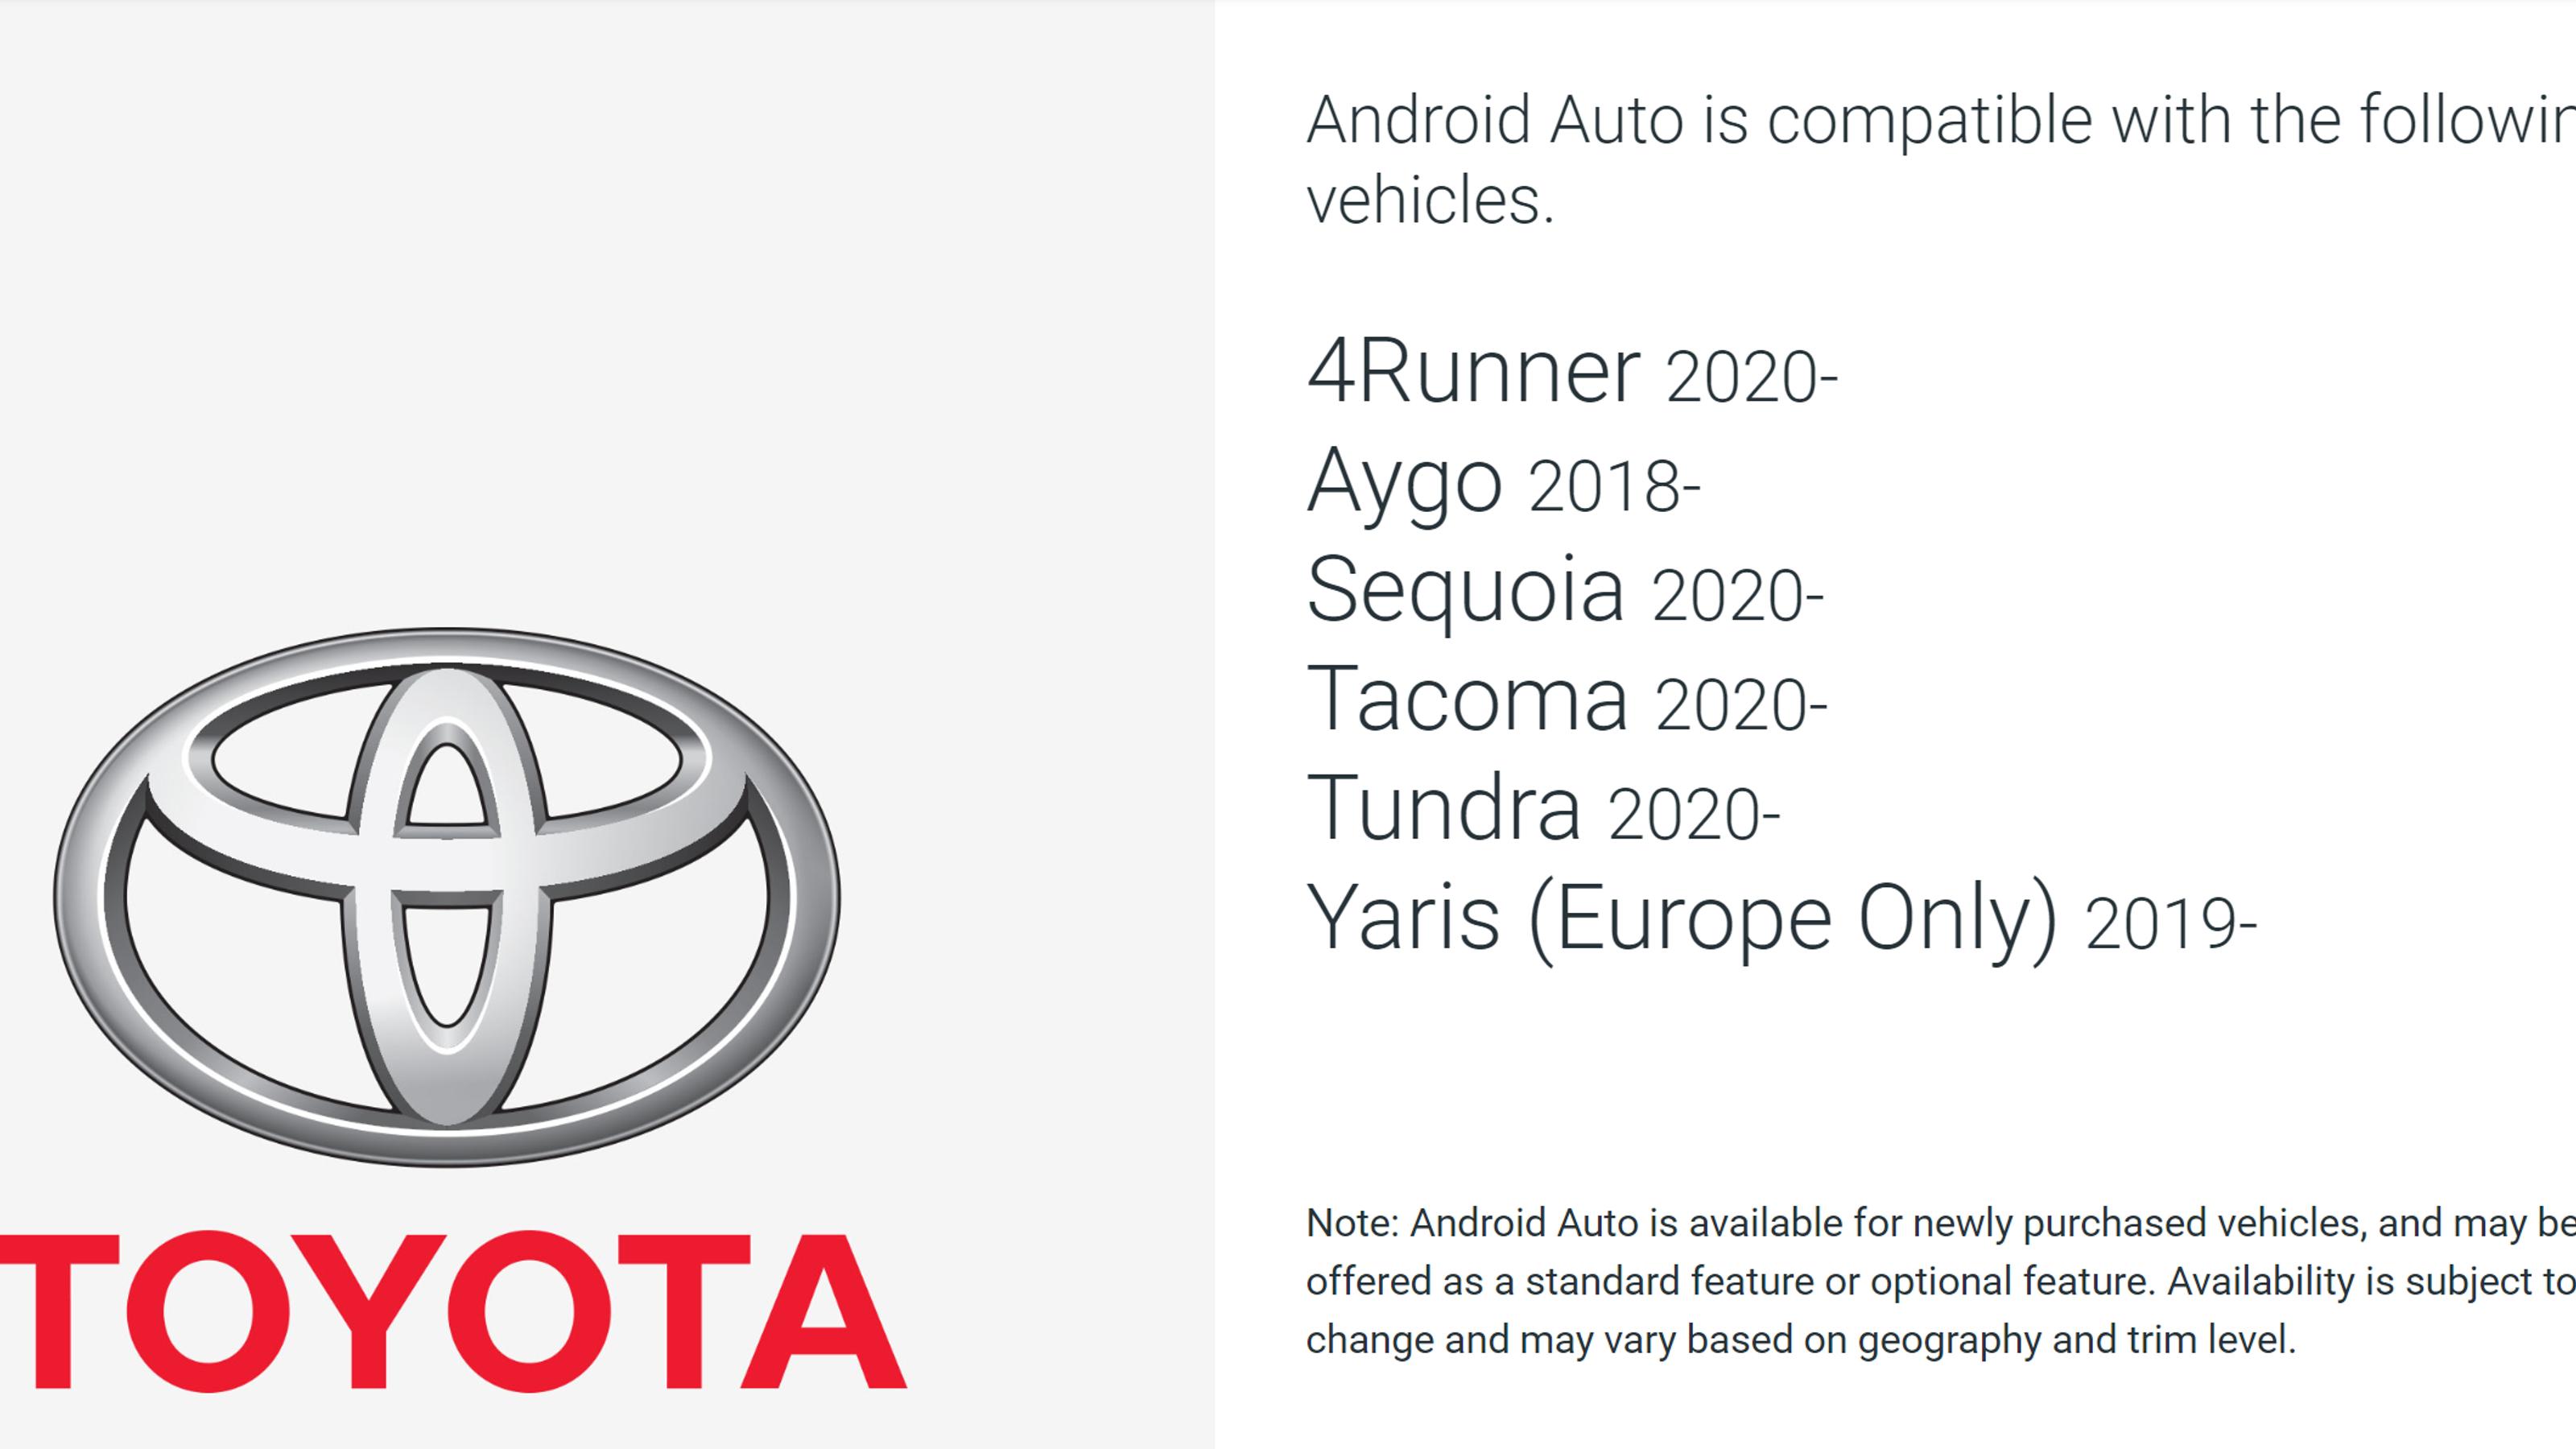 Google Autoが搭載されるトヨタ車種